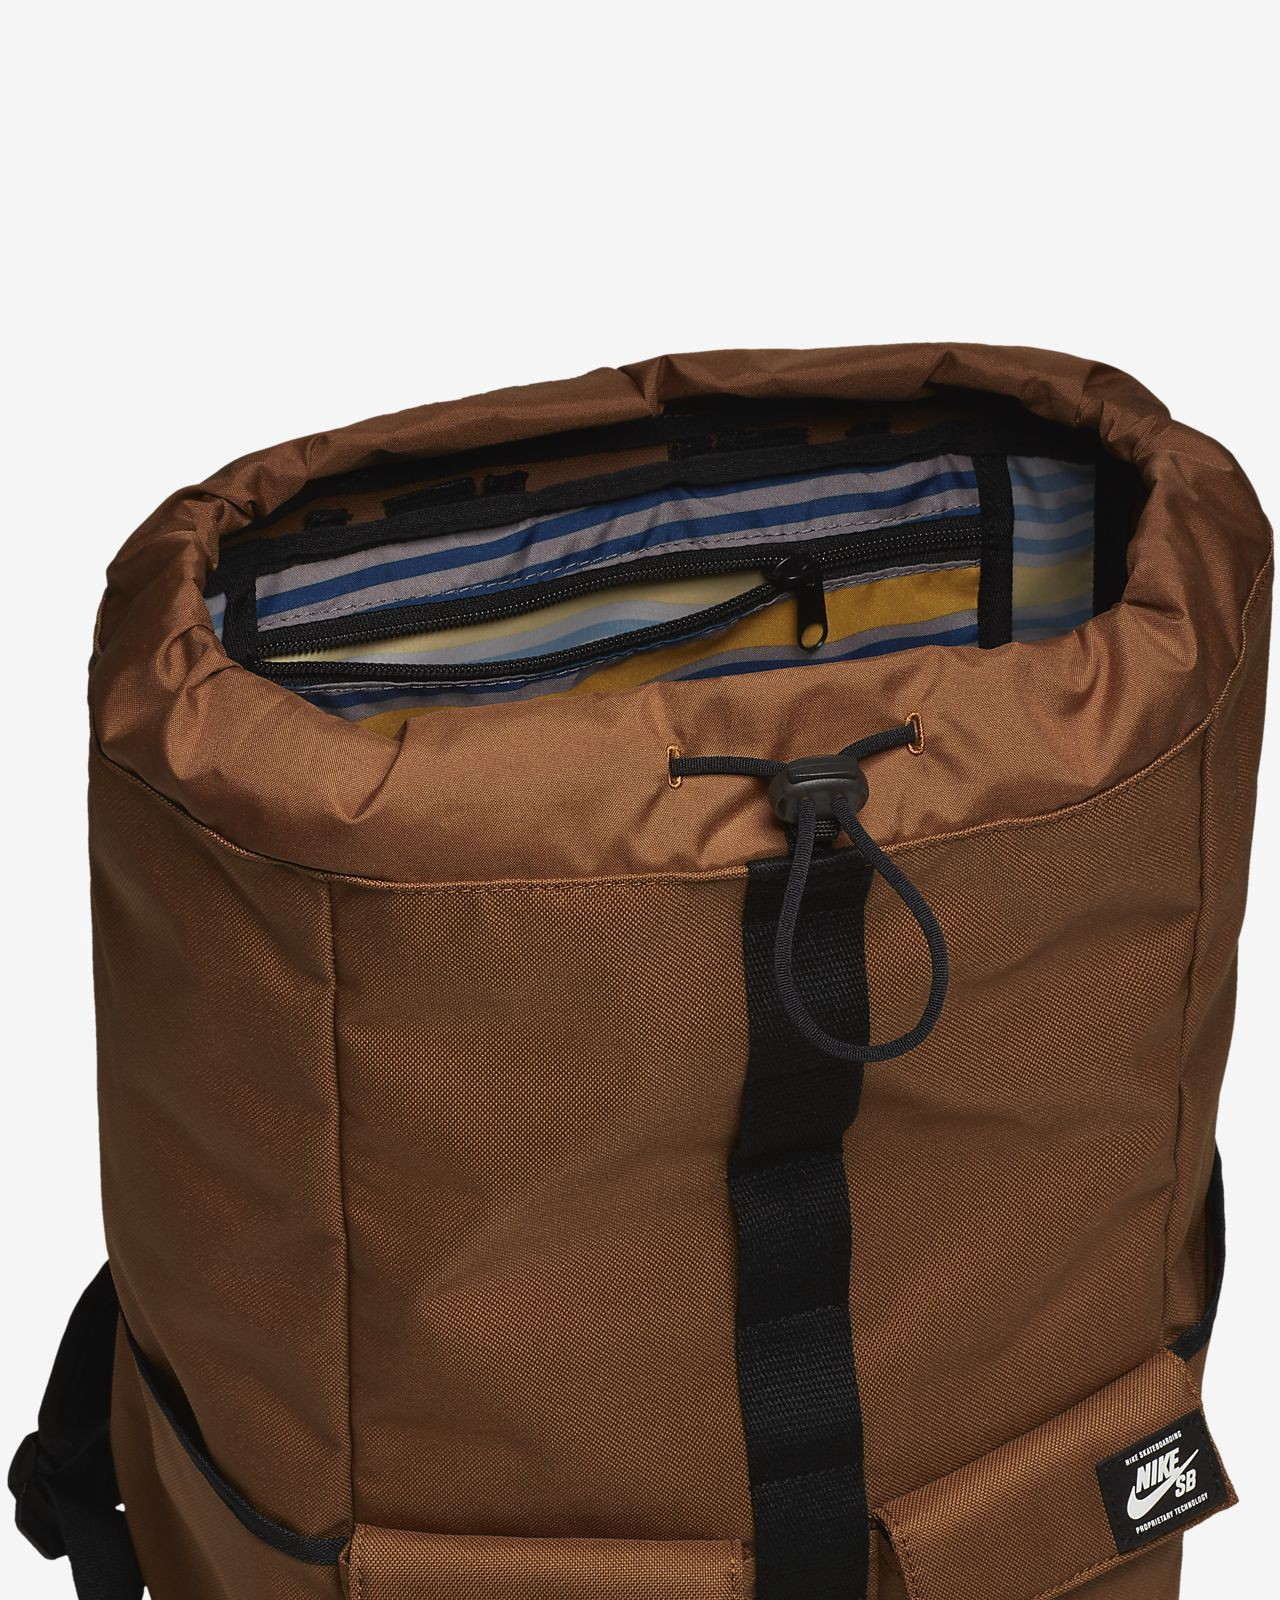 c18cec82b332 Nike SB Stockwell Backpack by Nike